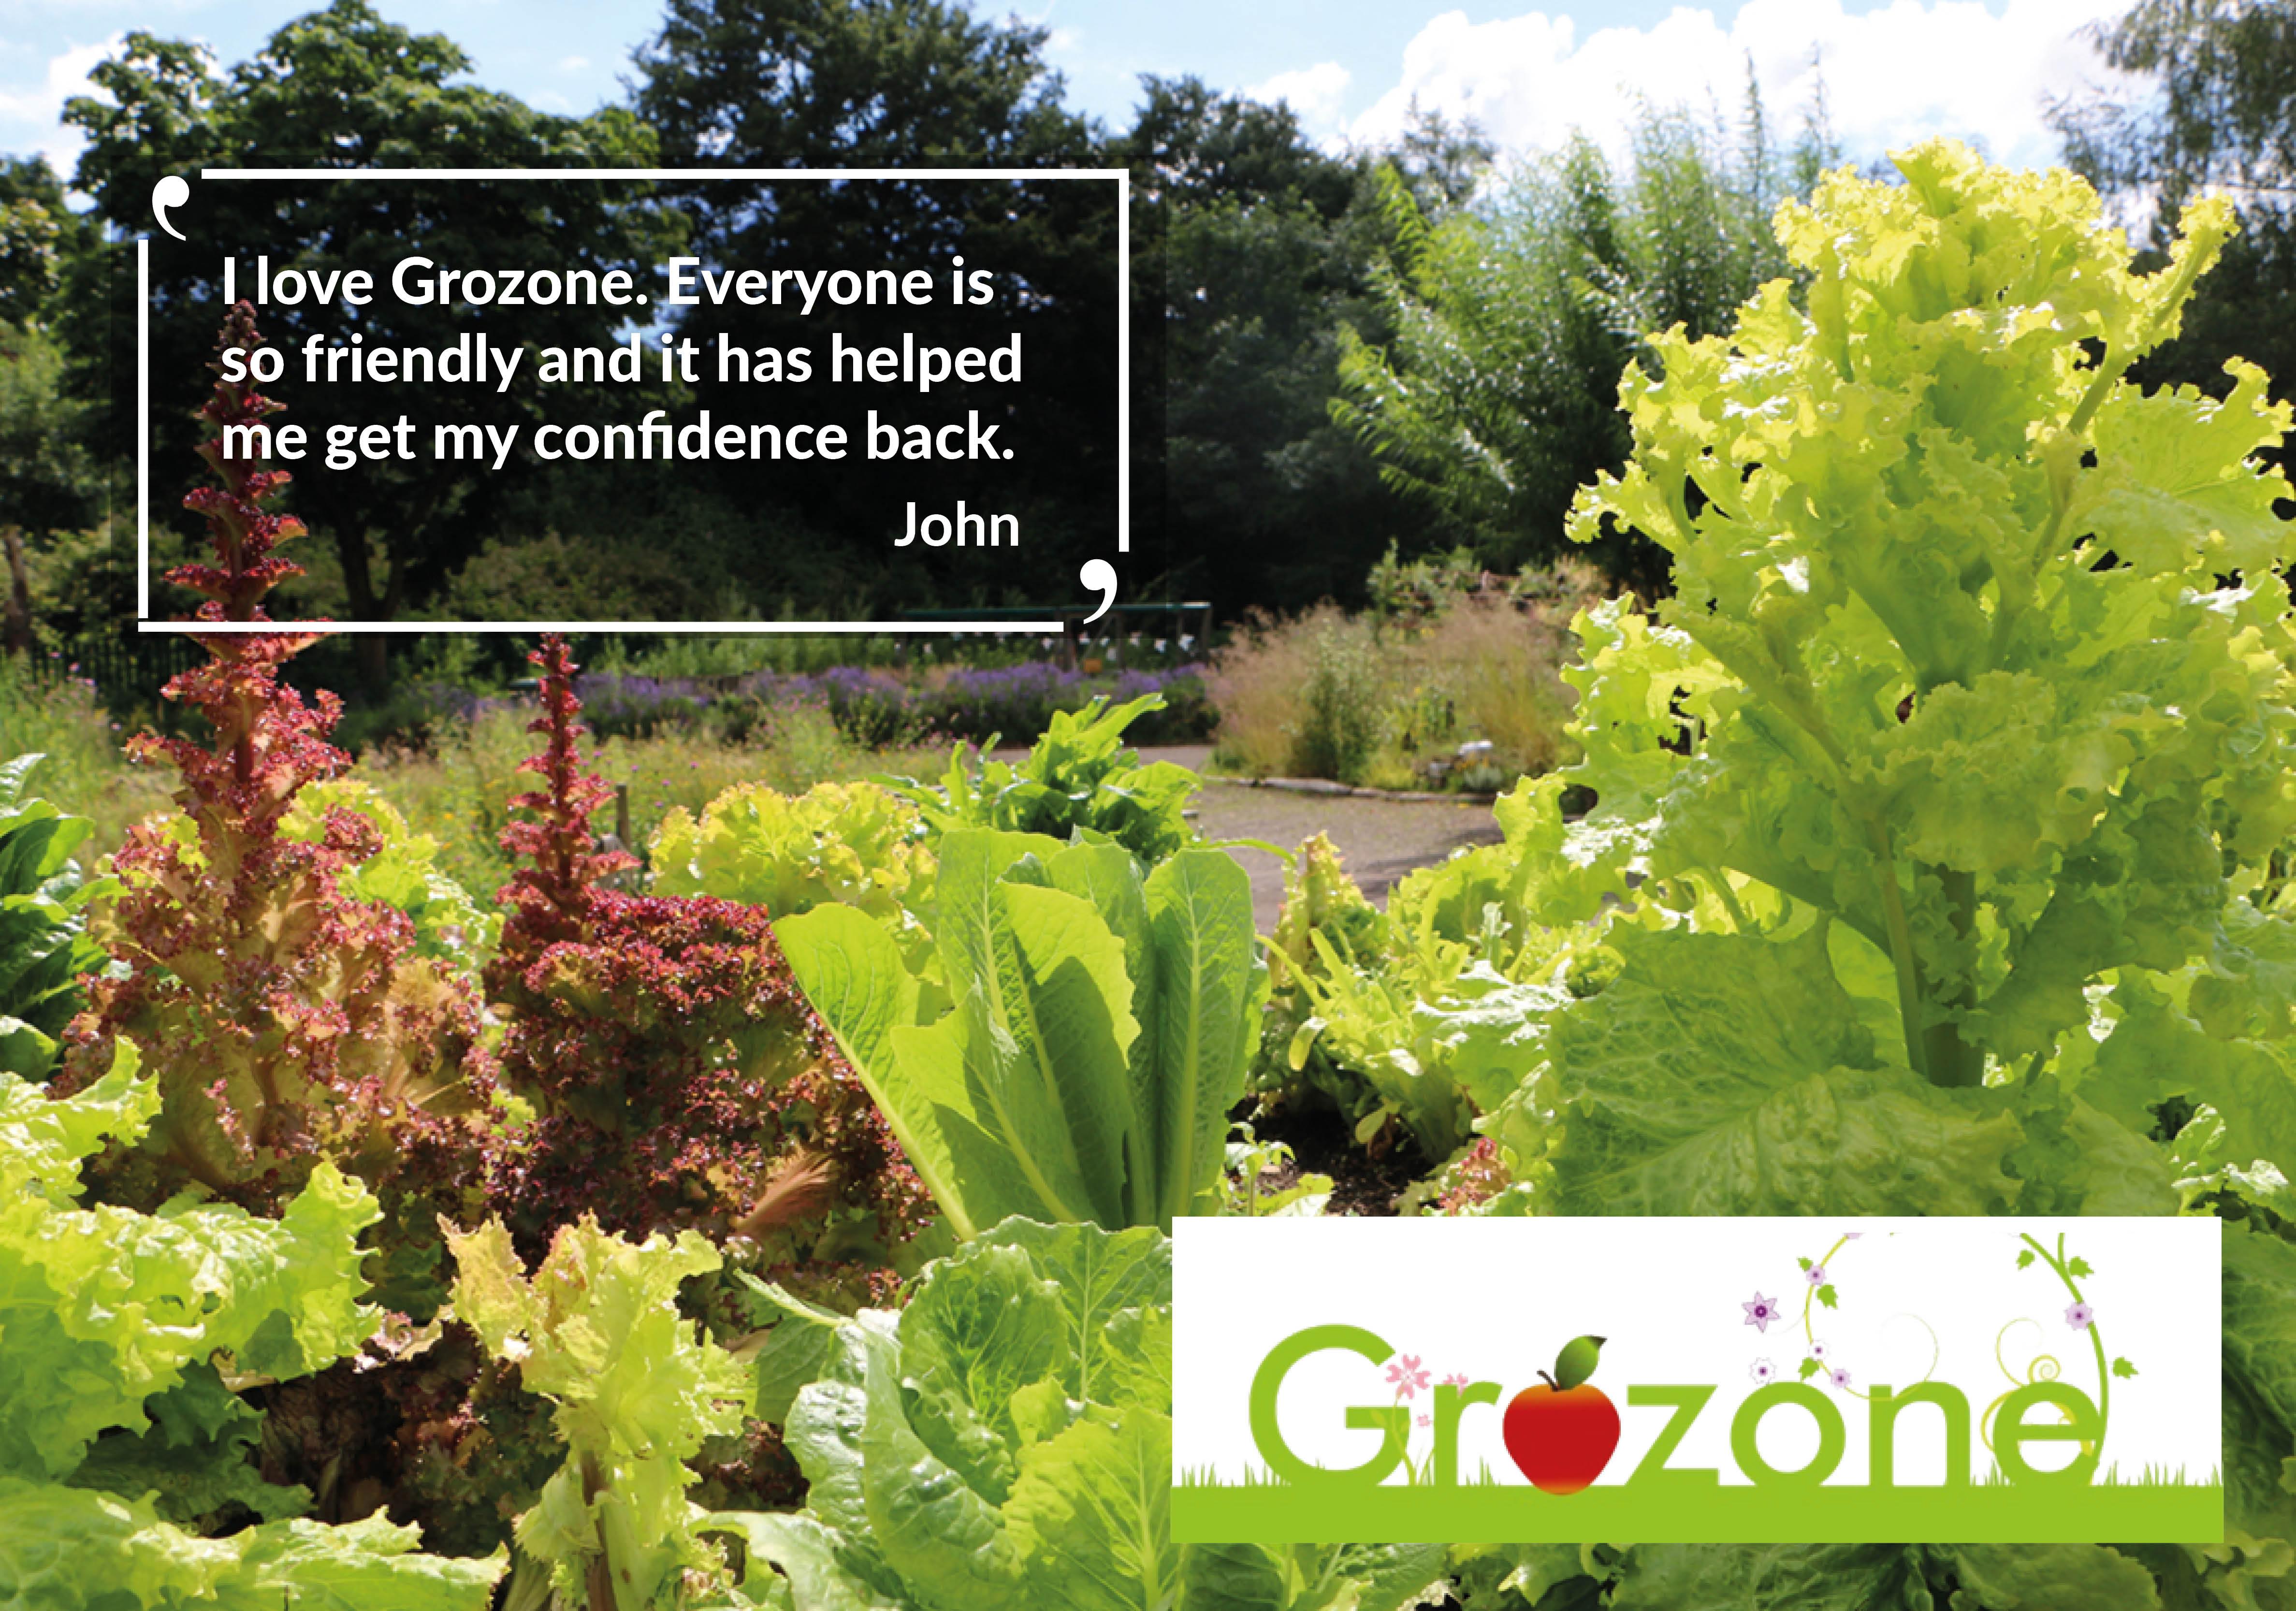 Grozone Community Garden in Cheshire